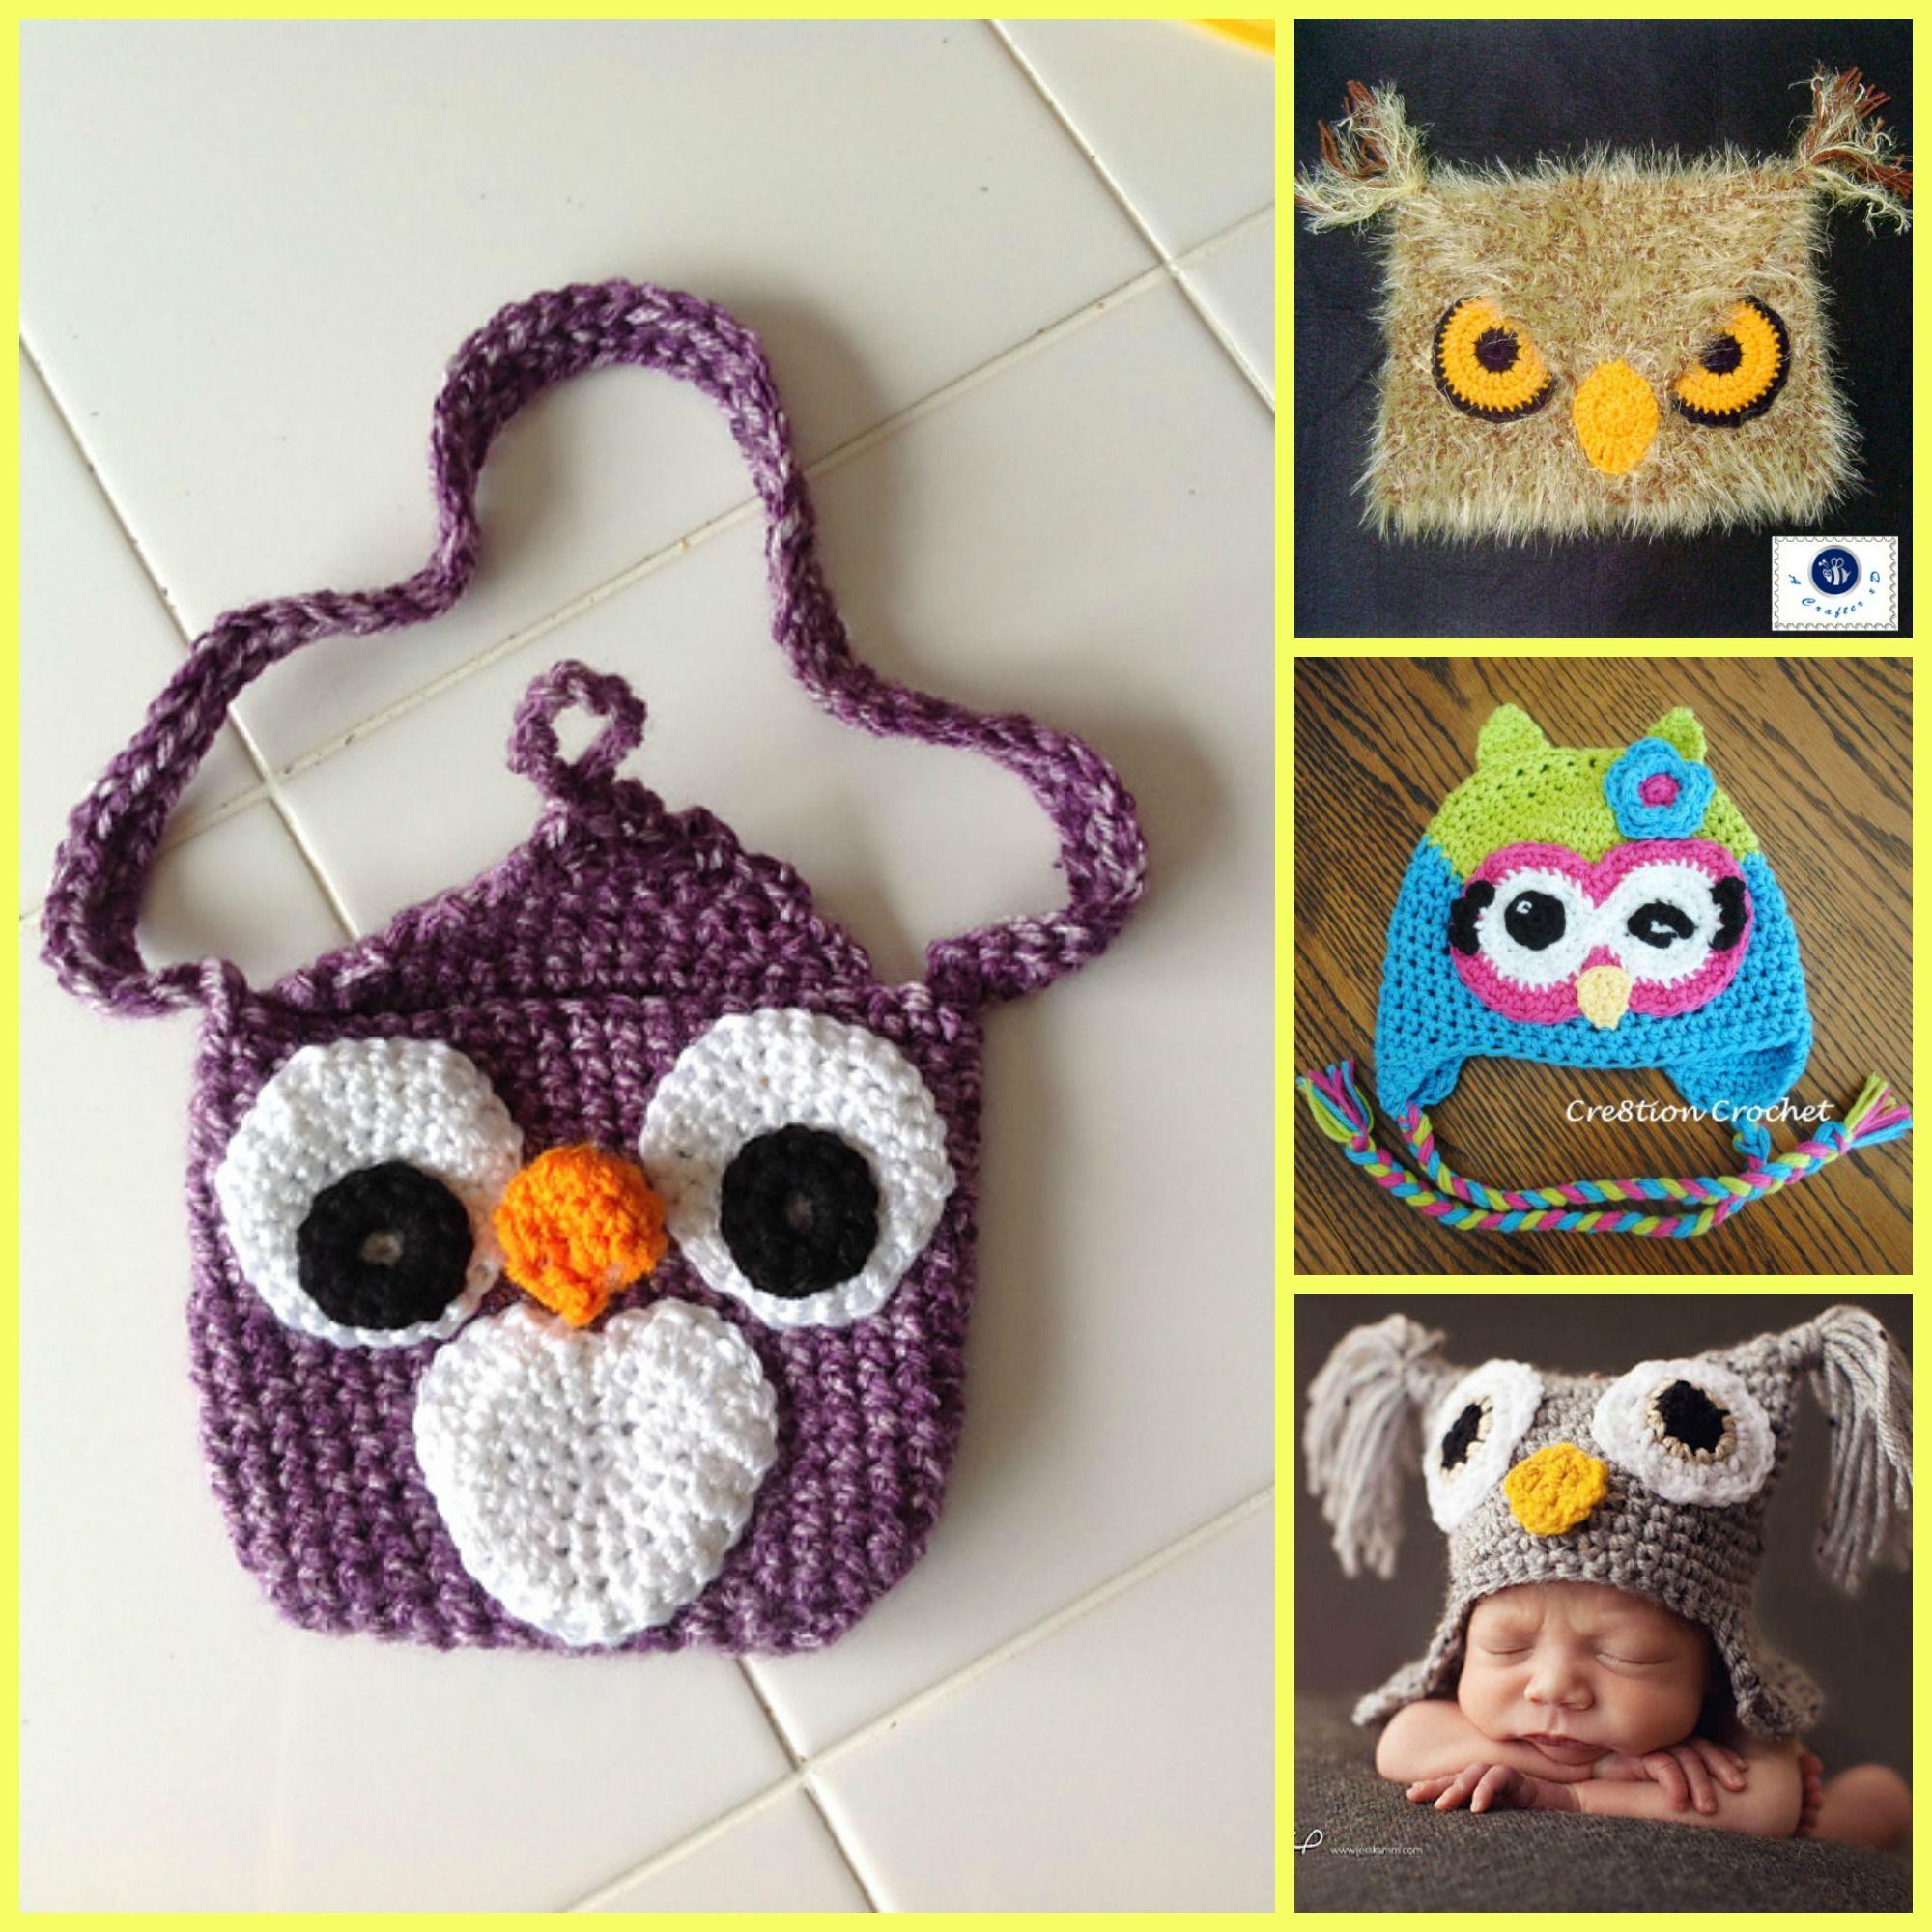 d929e73c183 Crochet Cute Owl Hats - Free Patterns  freecrochetpatterns  hat  owl